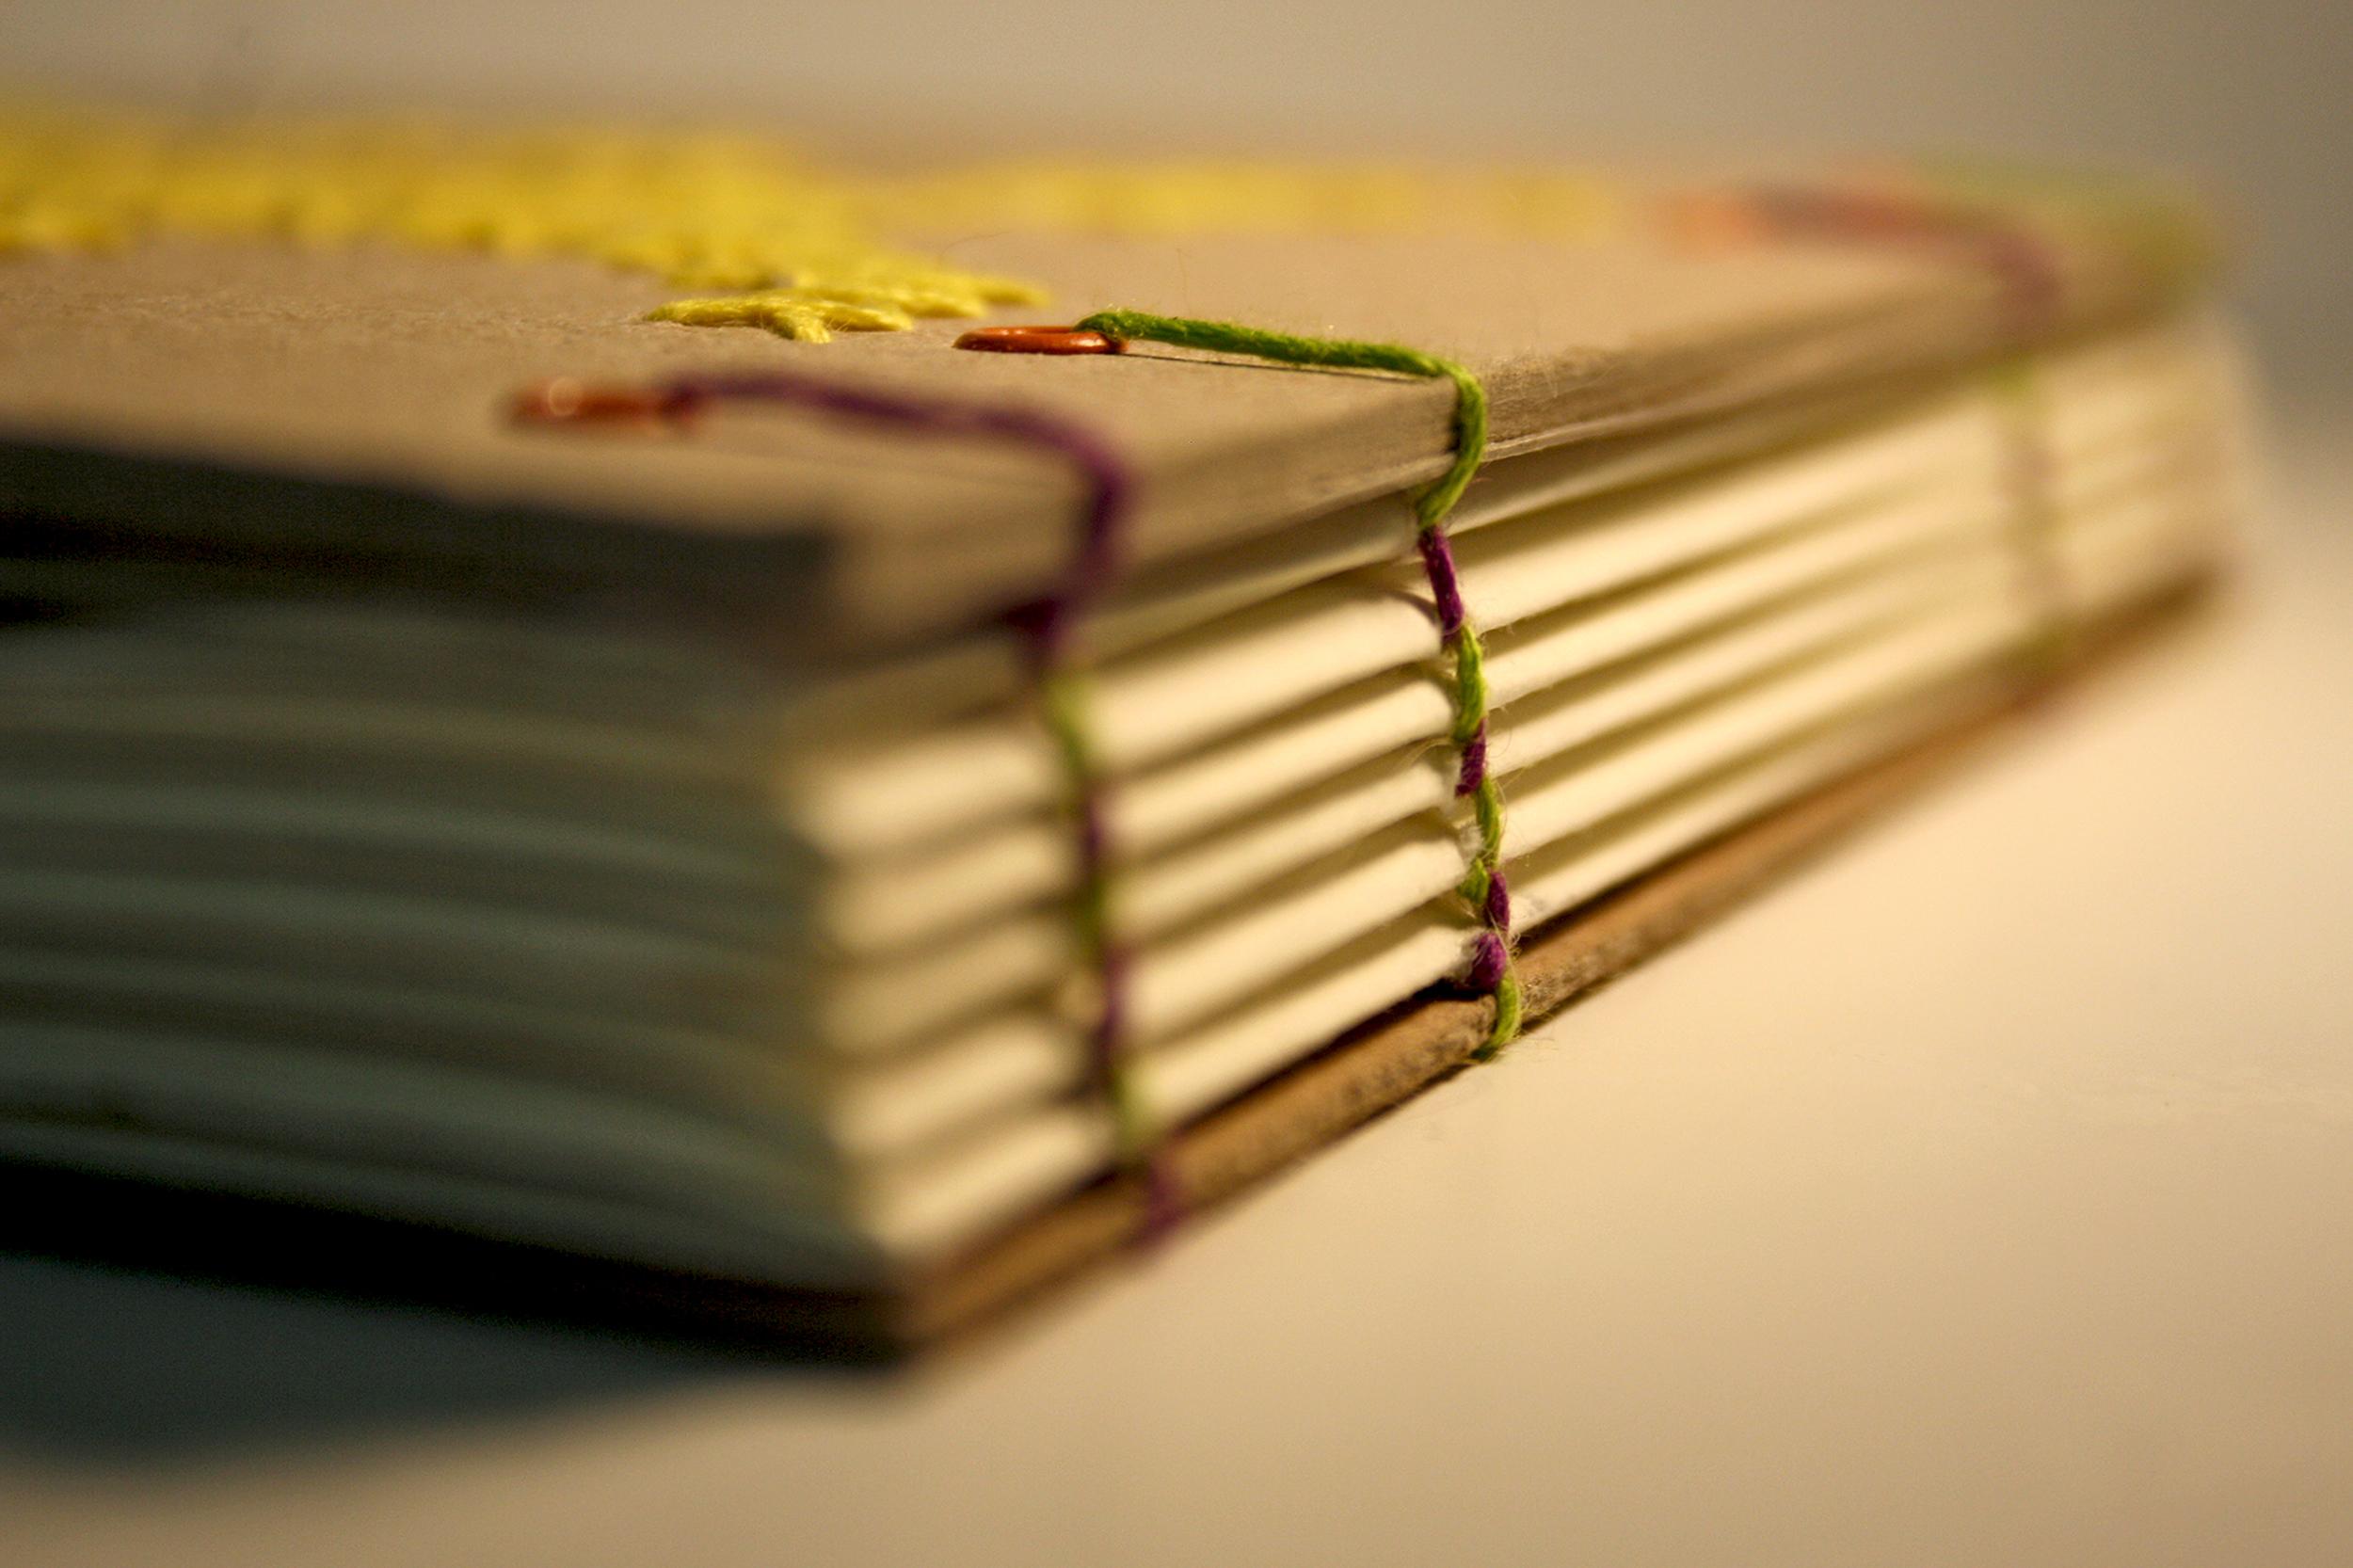 Bookbinding - Cross stitch - Imagine - spine.jpg